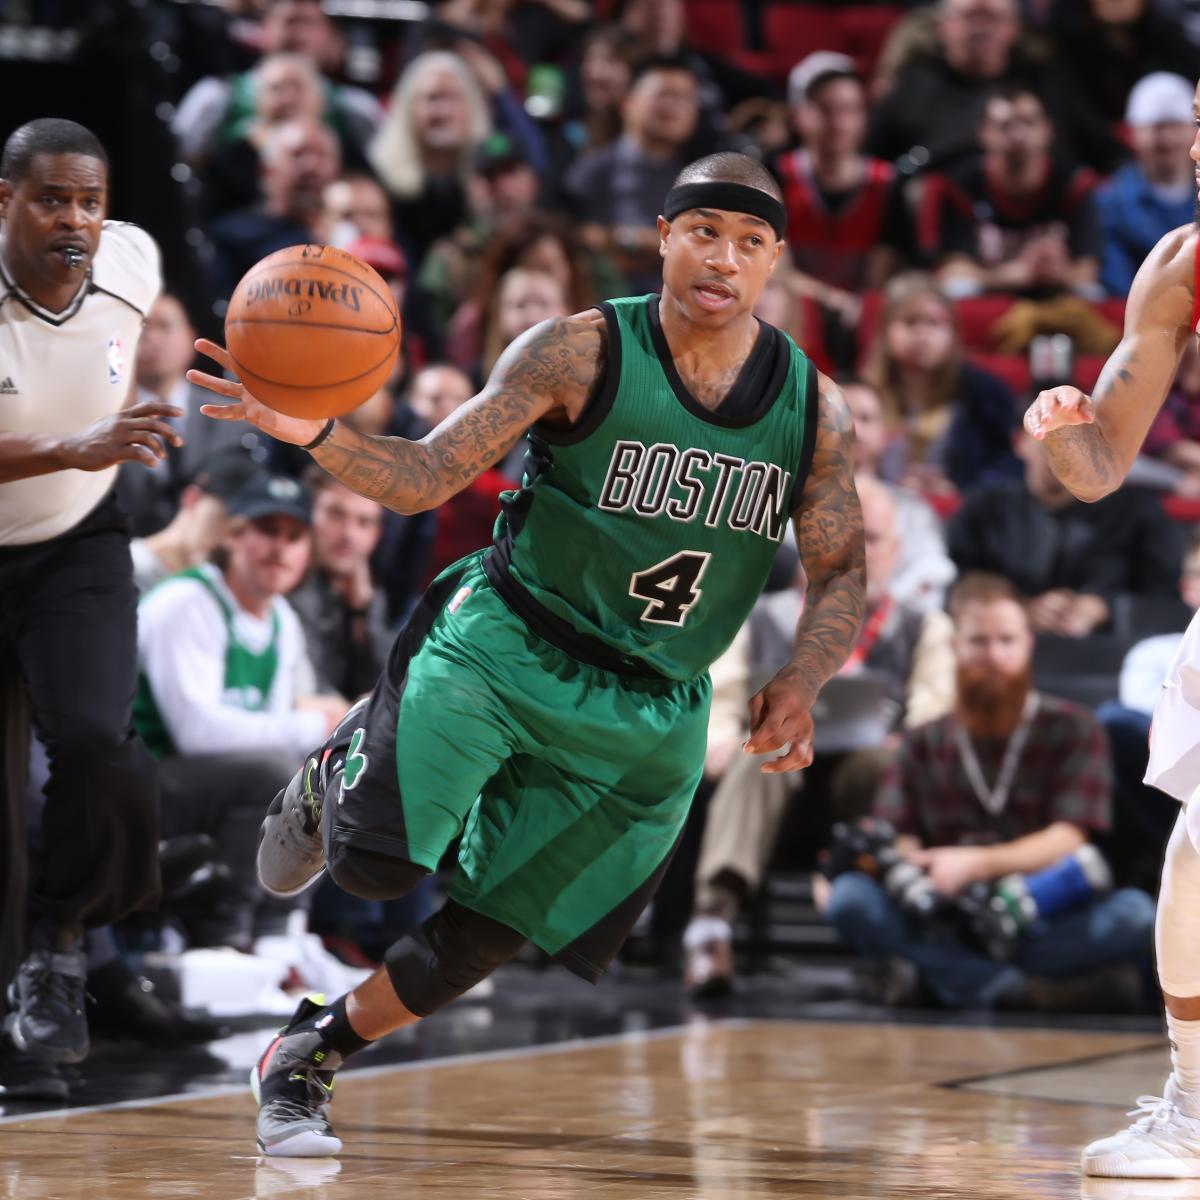 Portland Blazers Game Score: Celtics Vs. Trail Blazers: Score, Highlights, Reaction